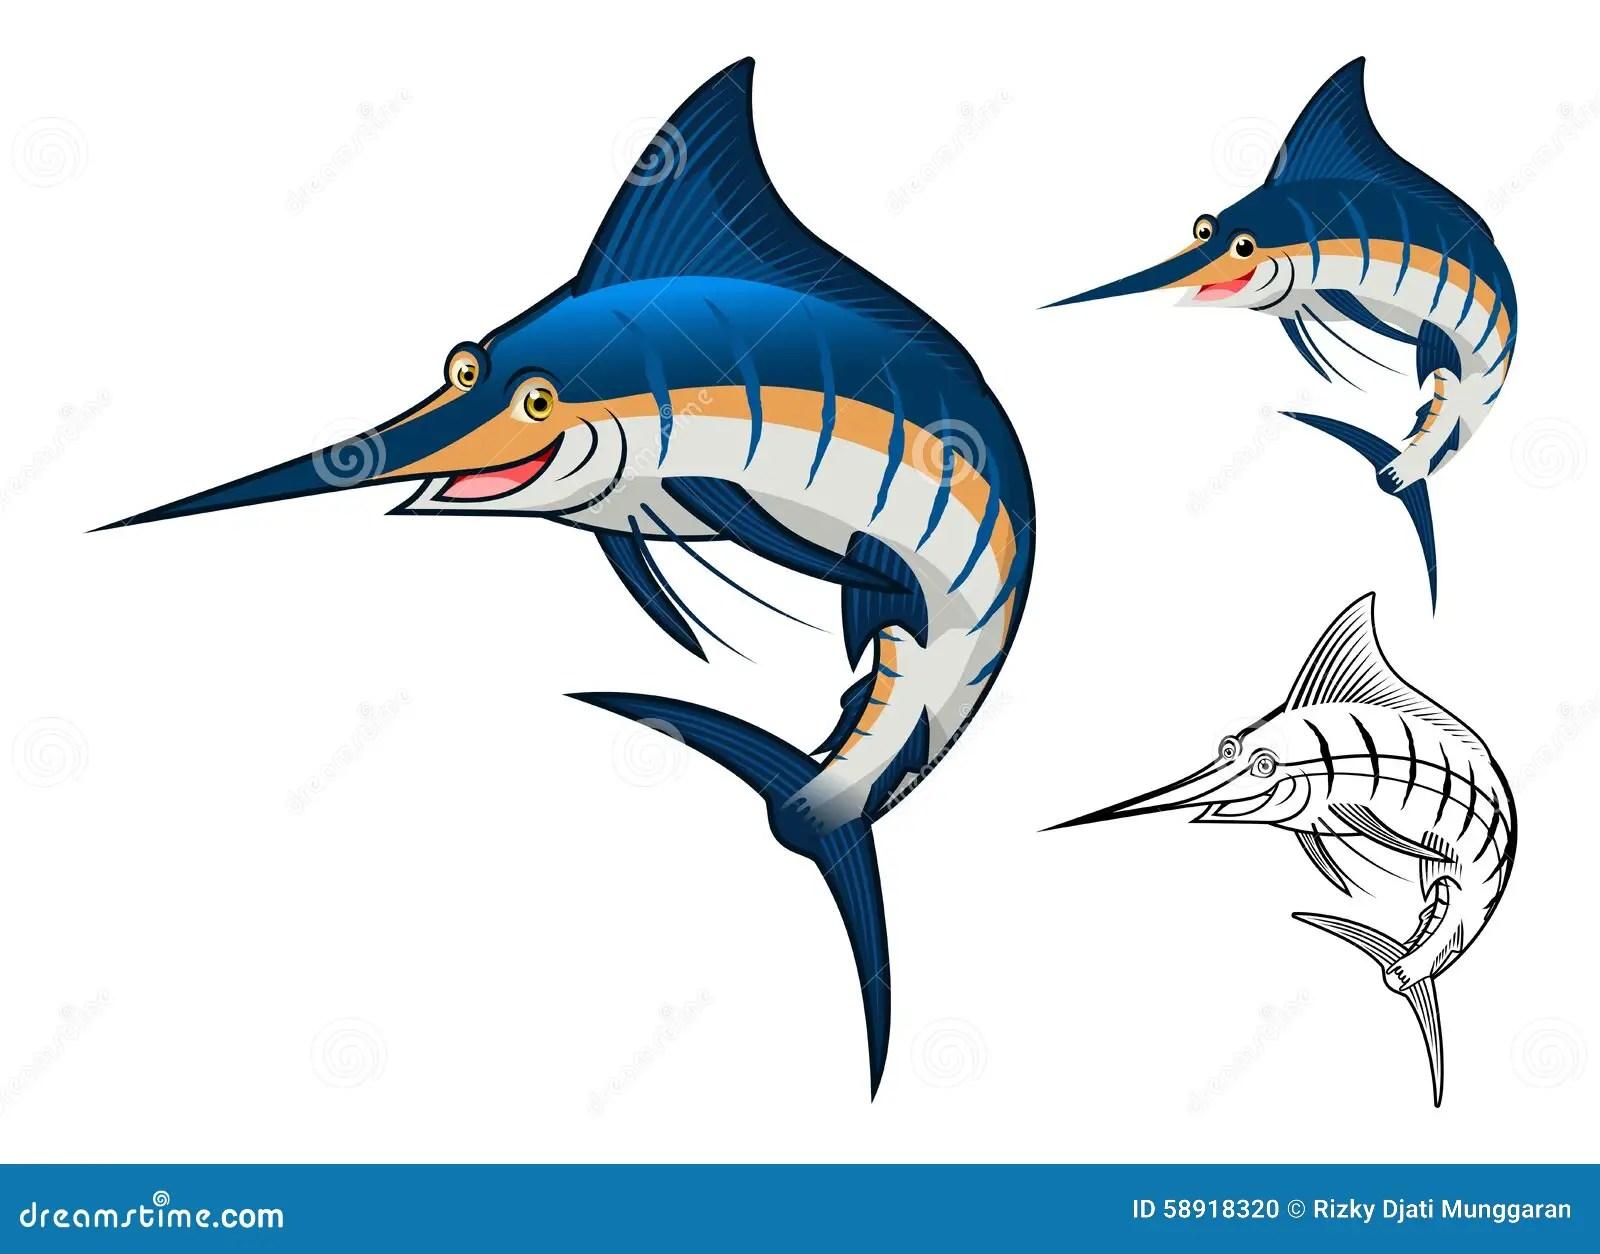 Coloring Book Sailfish Cartoon Vector